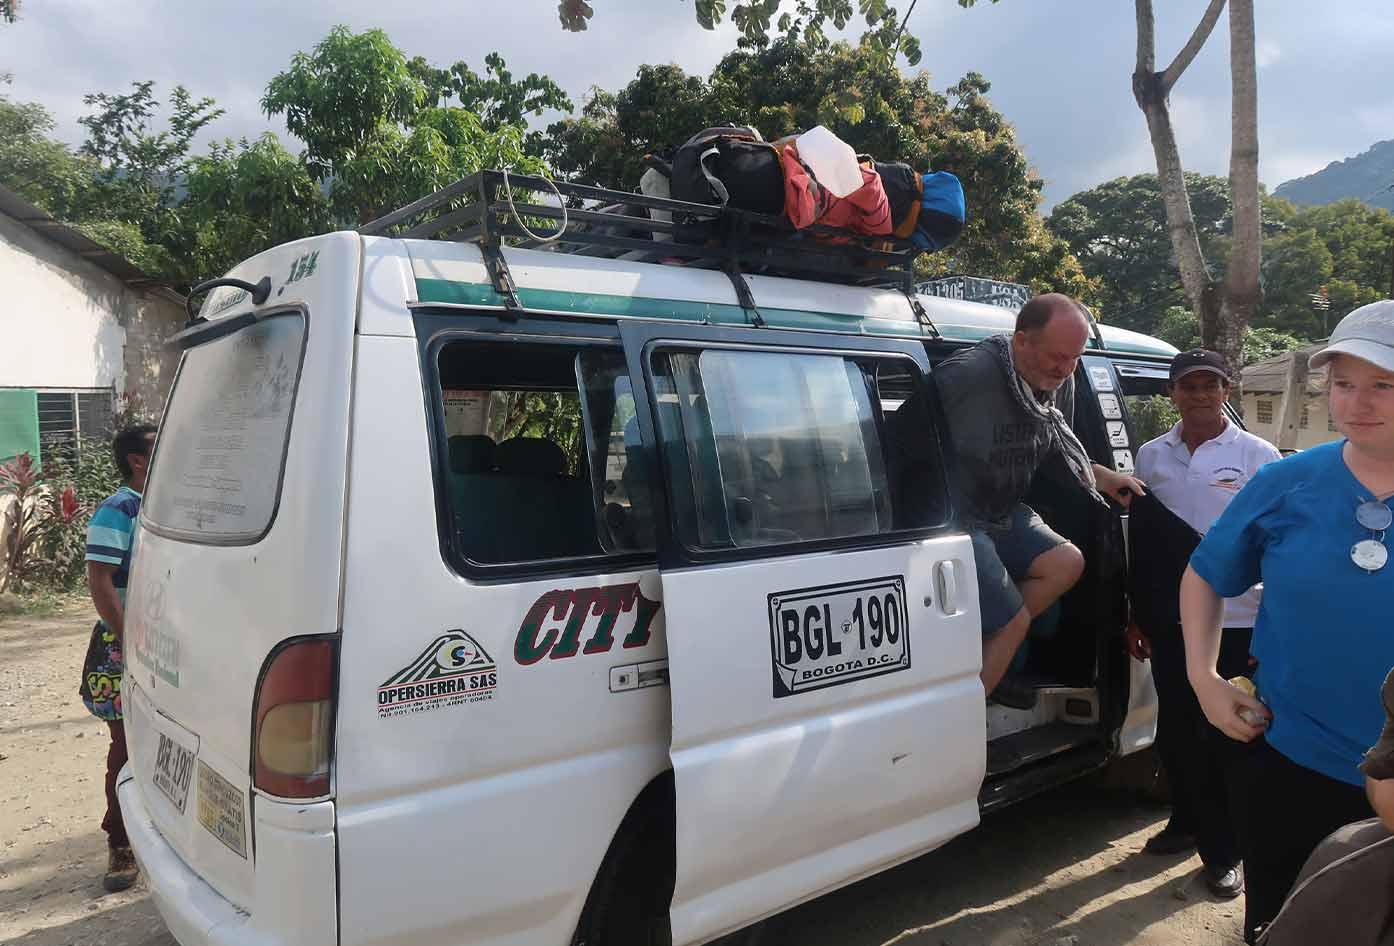 arriving in minca from santa marta